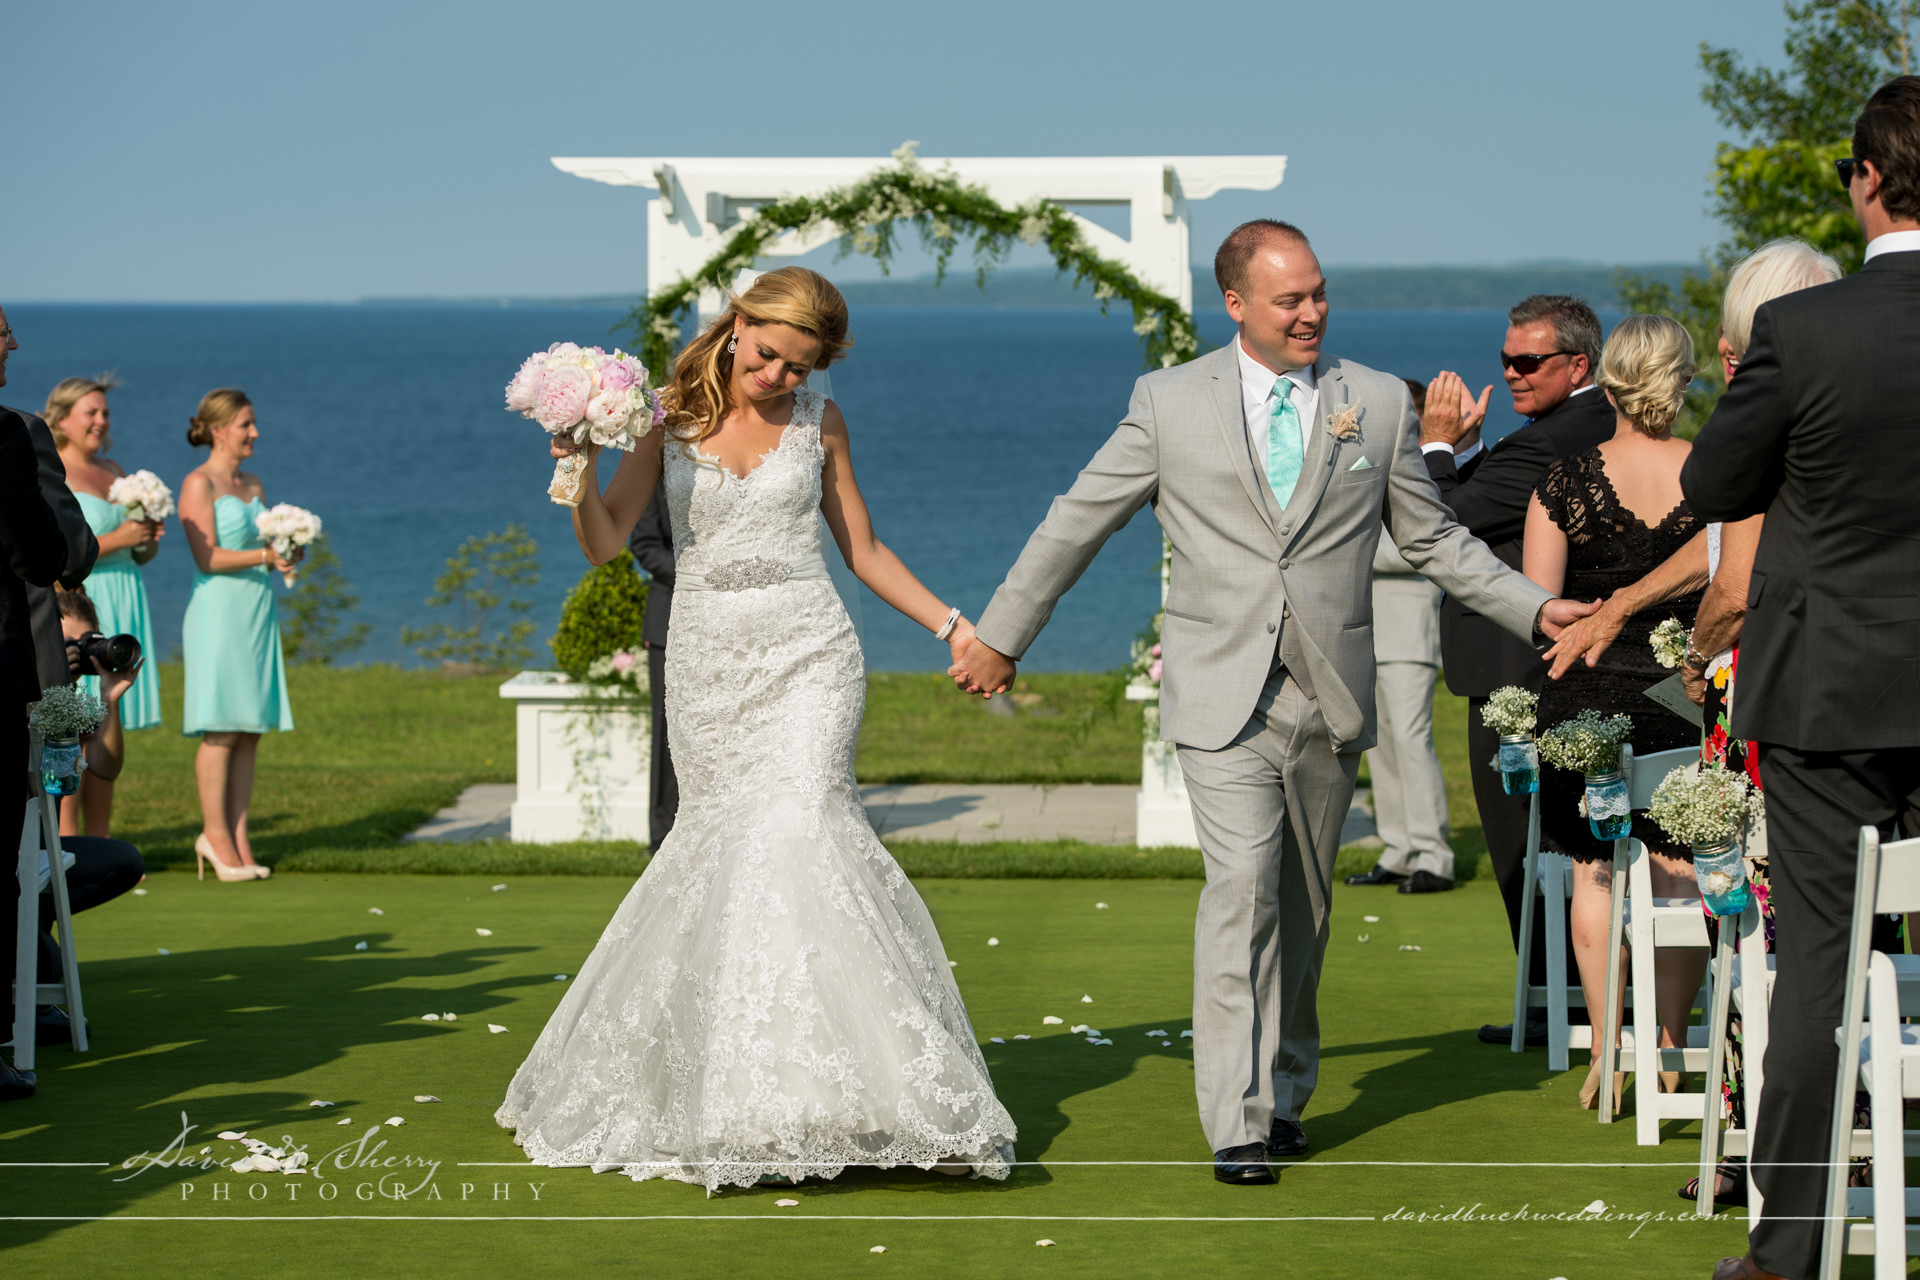 Cobble_Beach_Wedding_Photography_Owen_Sound_30